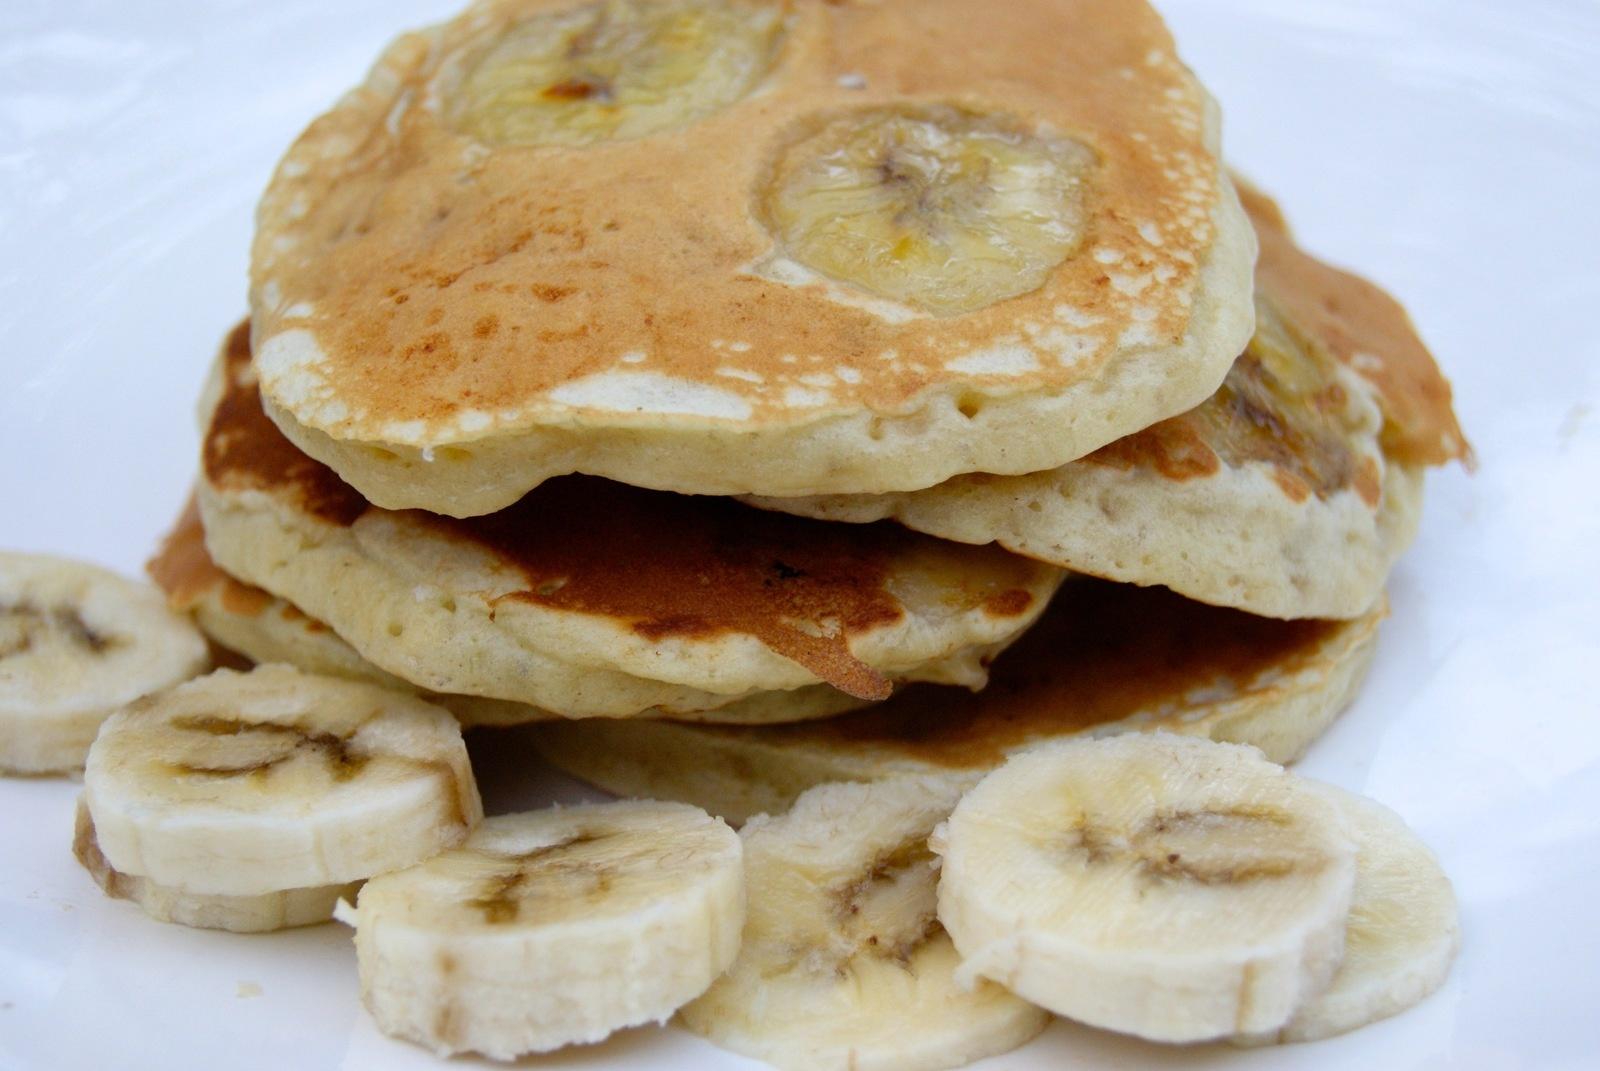 ob_61c13a_pancakes-bananes-brunch-etats-unis.jpg